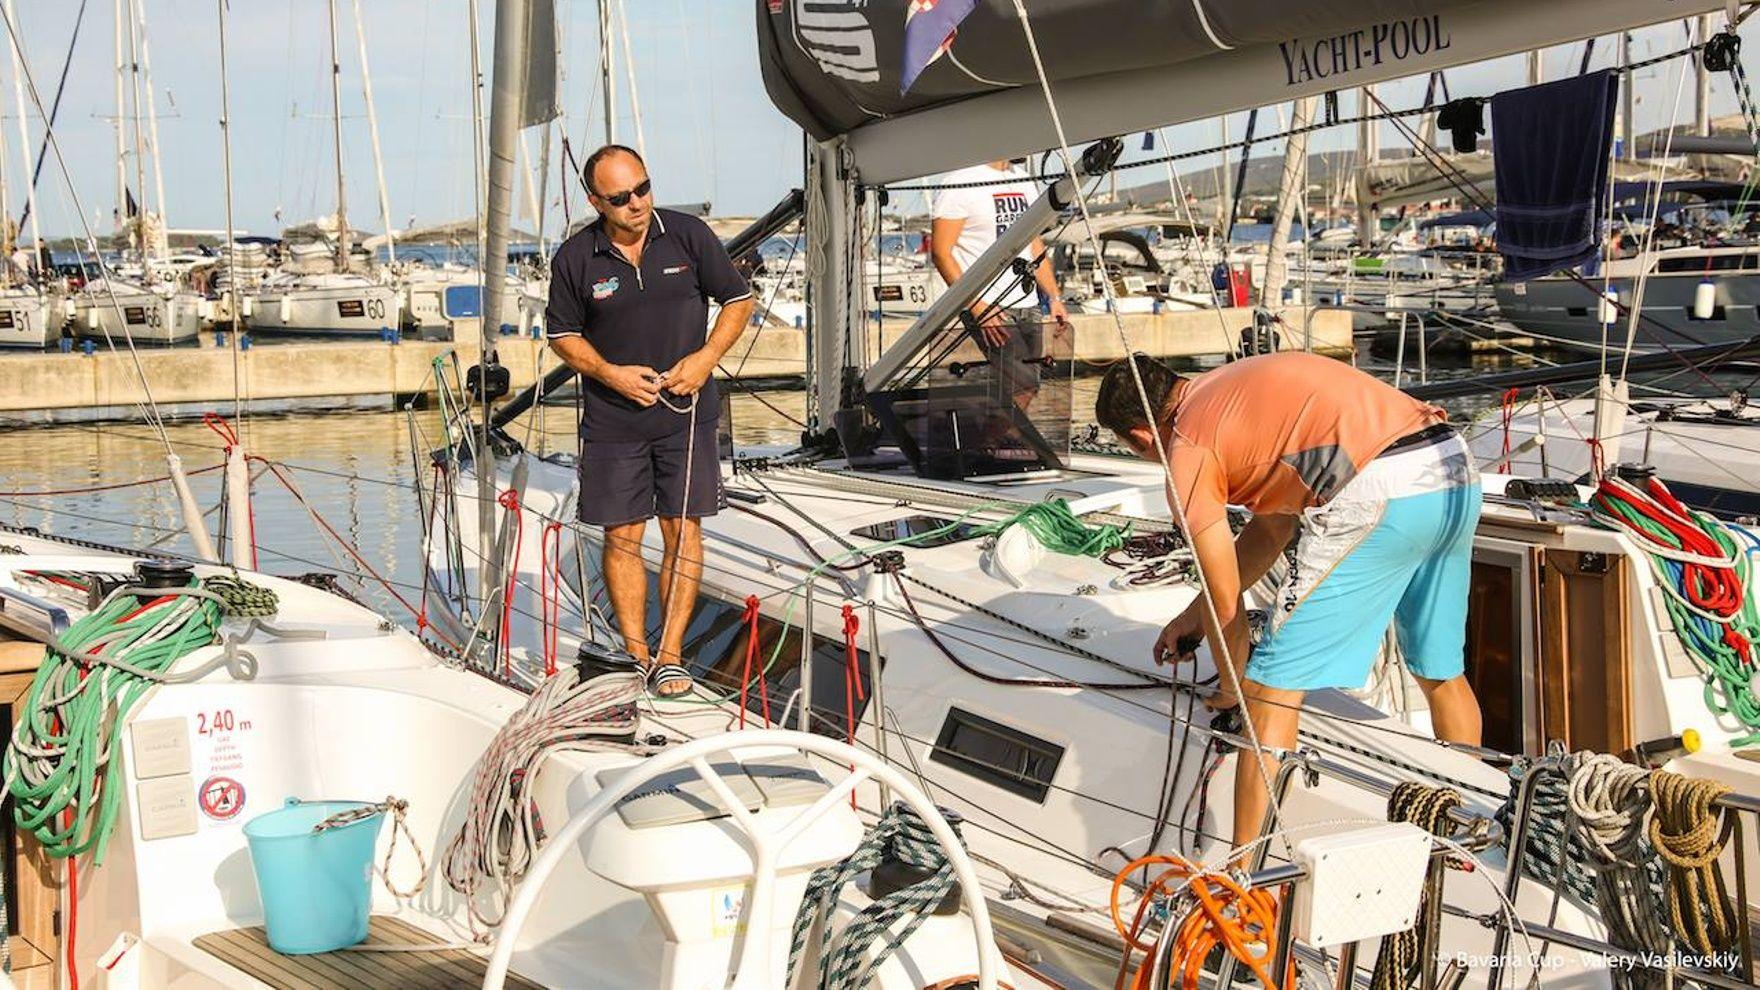 Обучение яхтингу - от новичка до шкипера